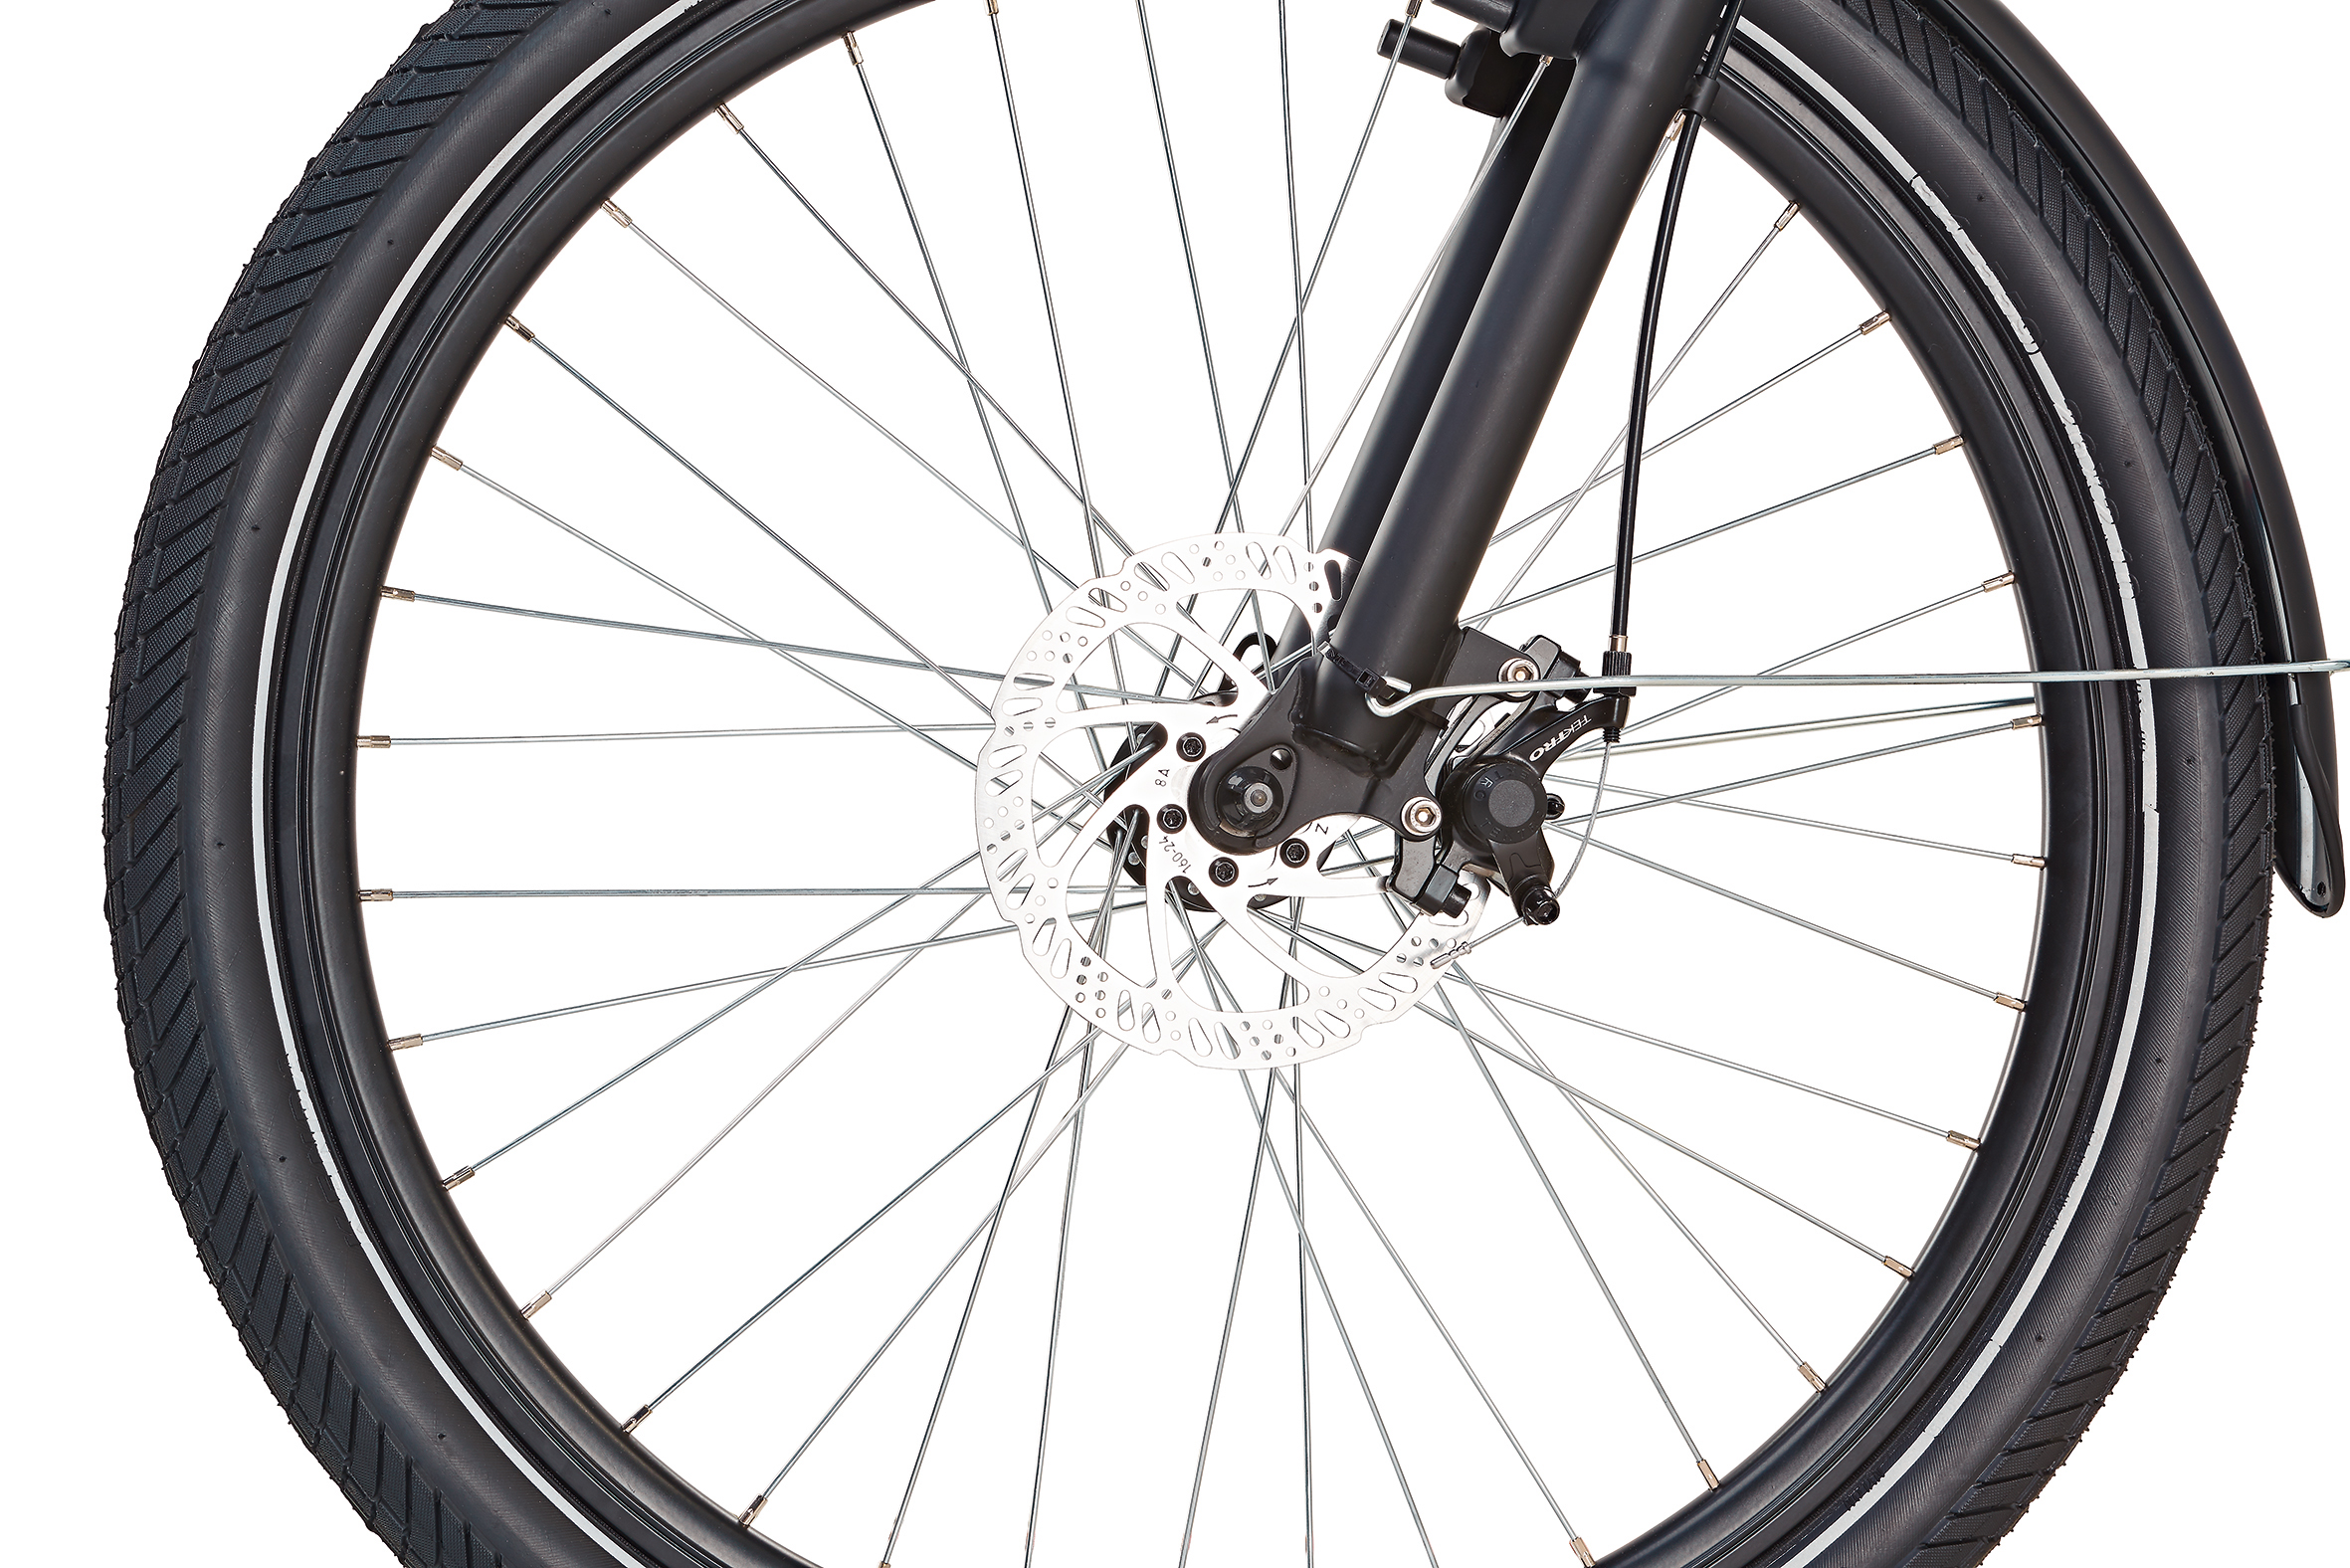 "Rex Bike Fahrrad / All Terrain Bike Graveler 9.3 ATB 26"" Bild 5"